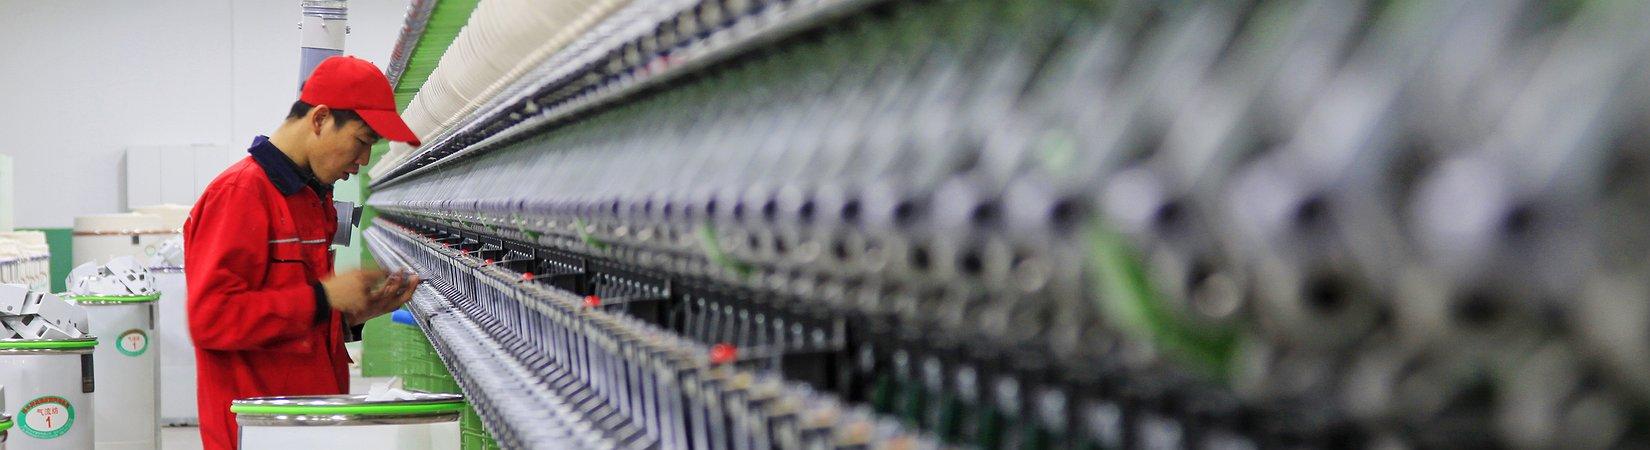 ¿Serán los robots la ruina de China?